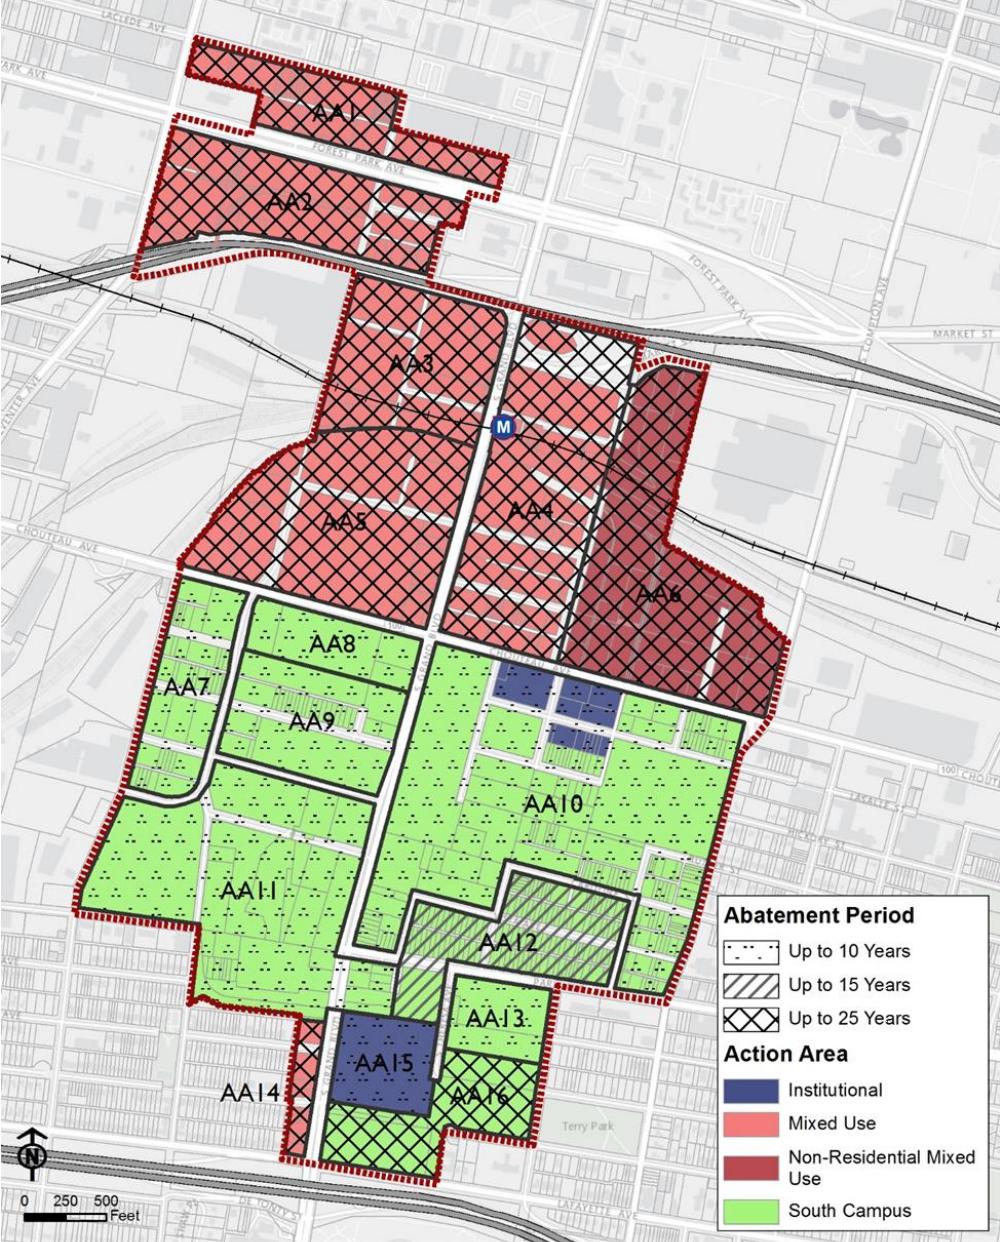 Midtown 353 Redevelopment Plan_abatement period